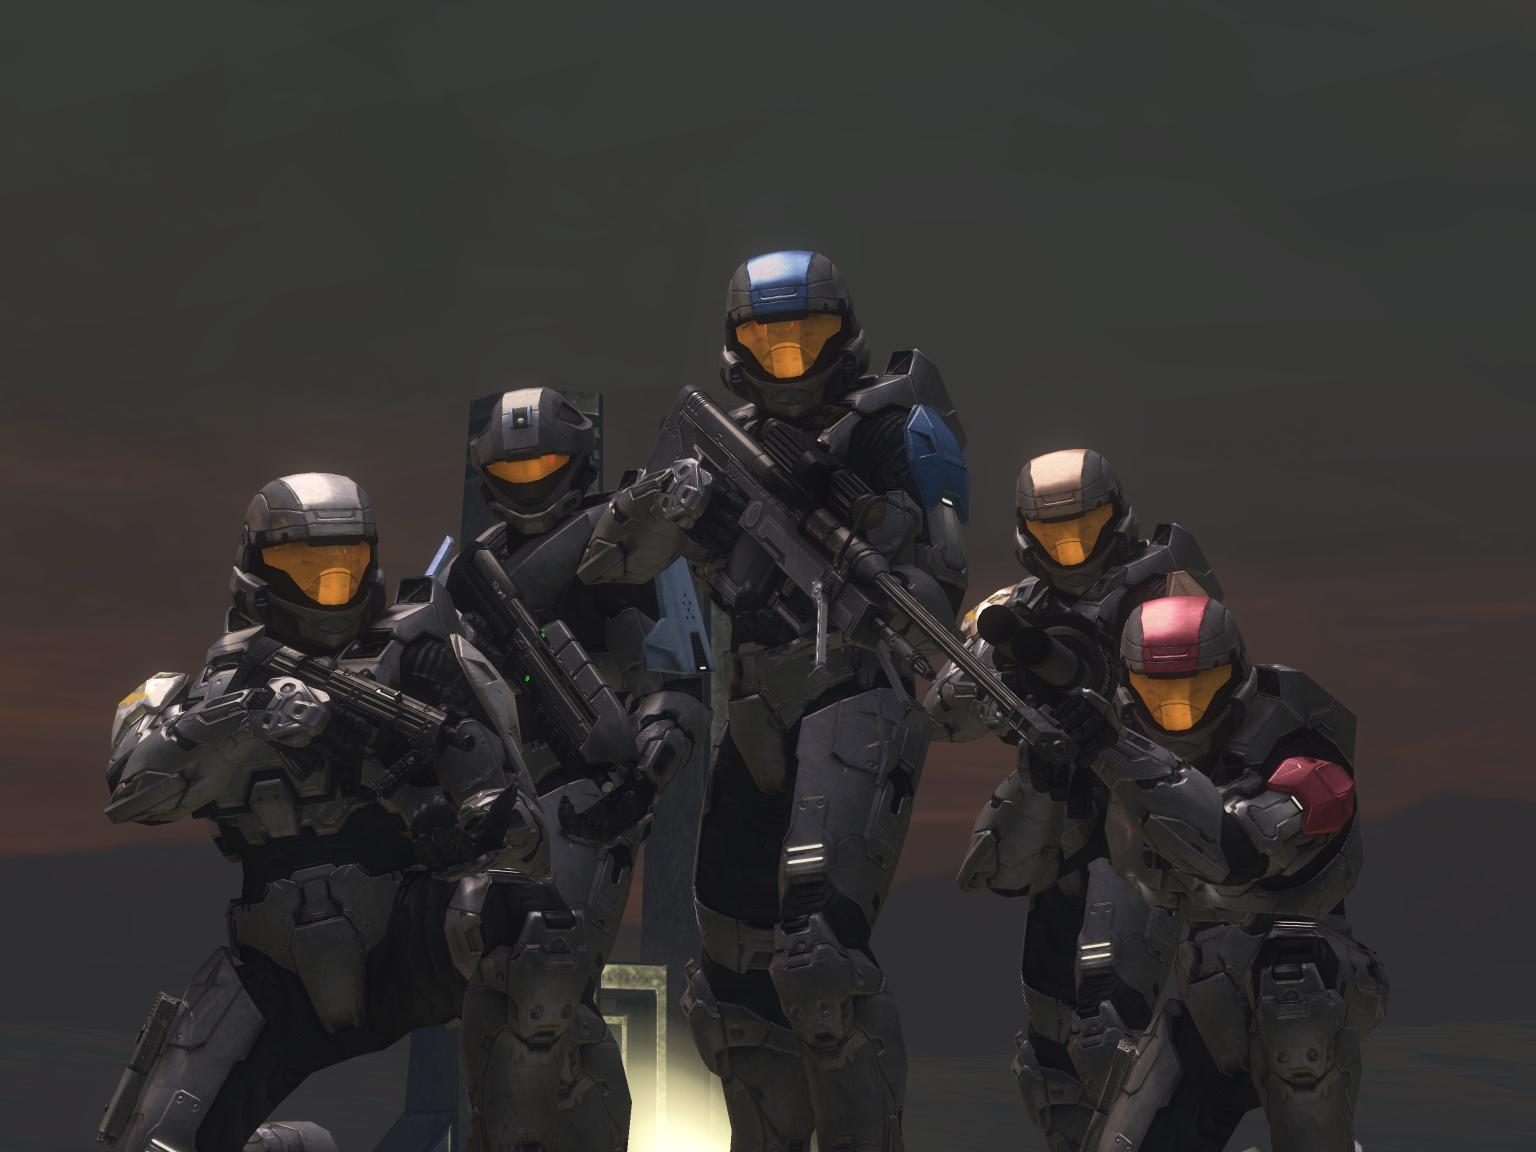 Halo 3 ODST image - Mod DB